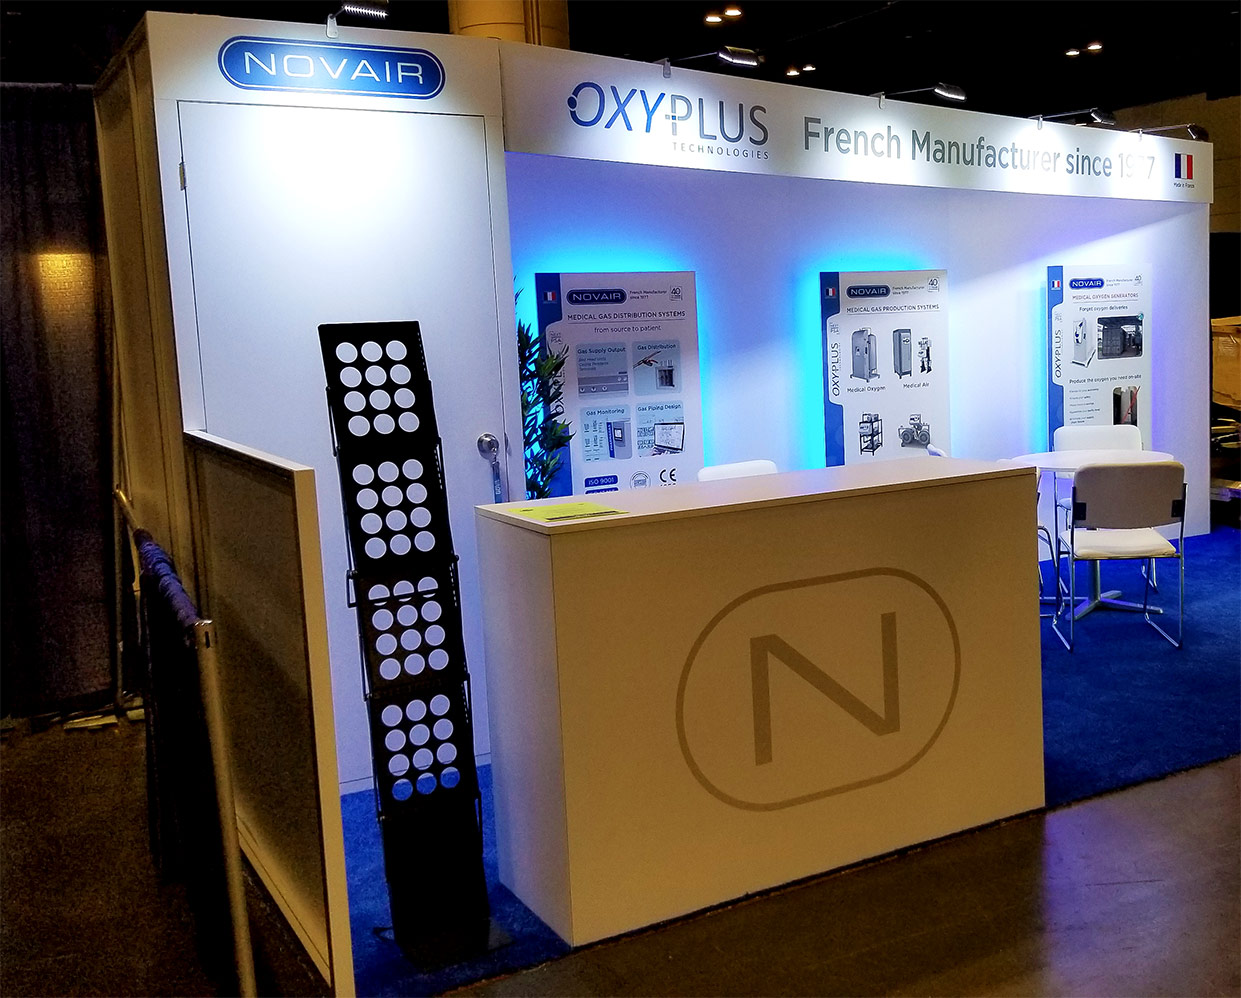 Exhibition Stands In Orlando : Exhibition stands in orlando trade show services octametro